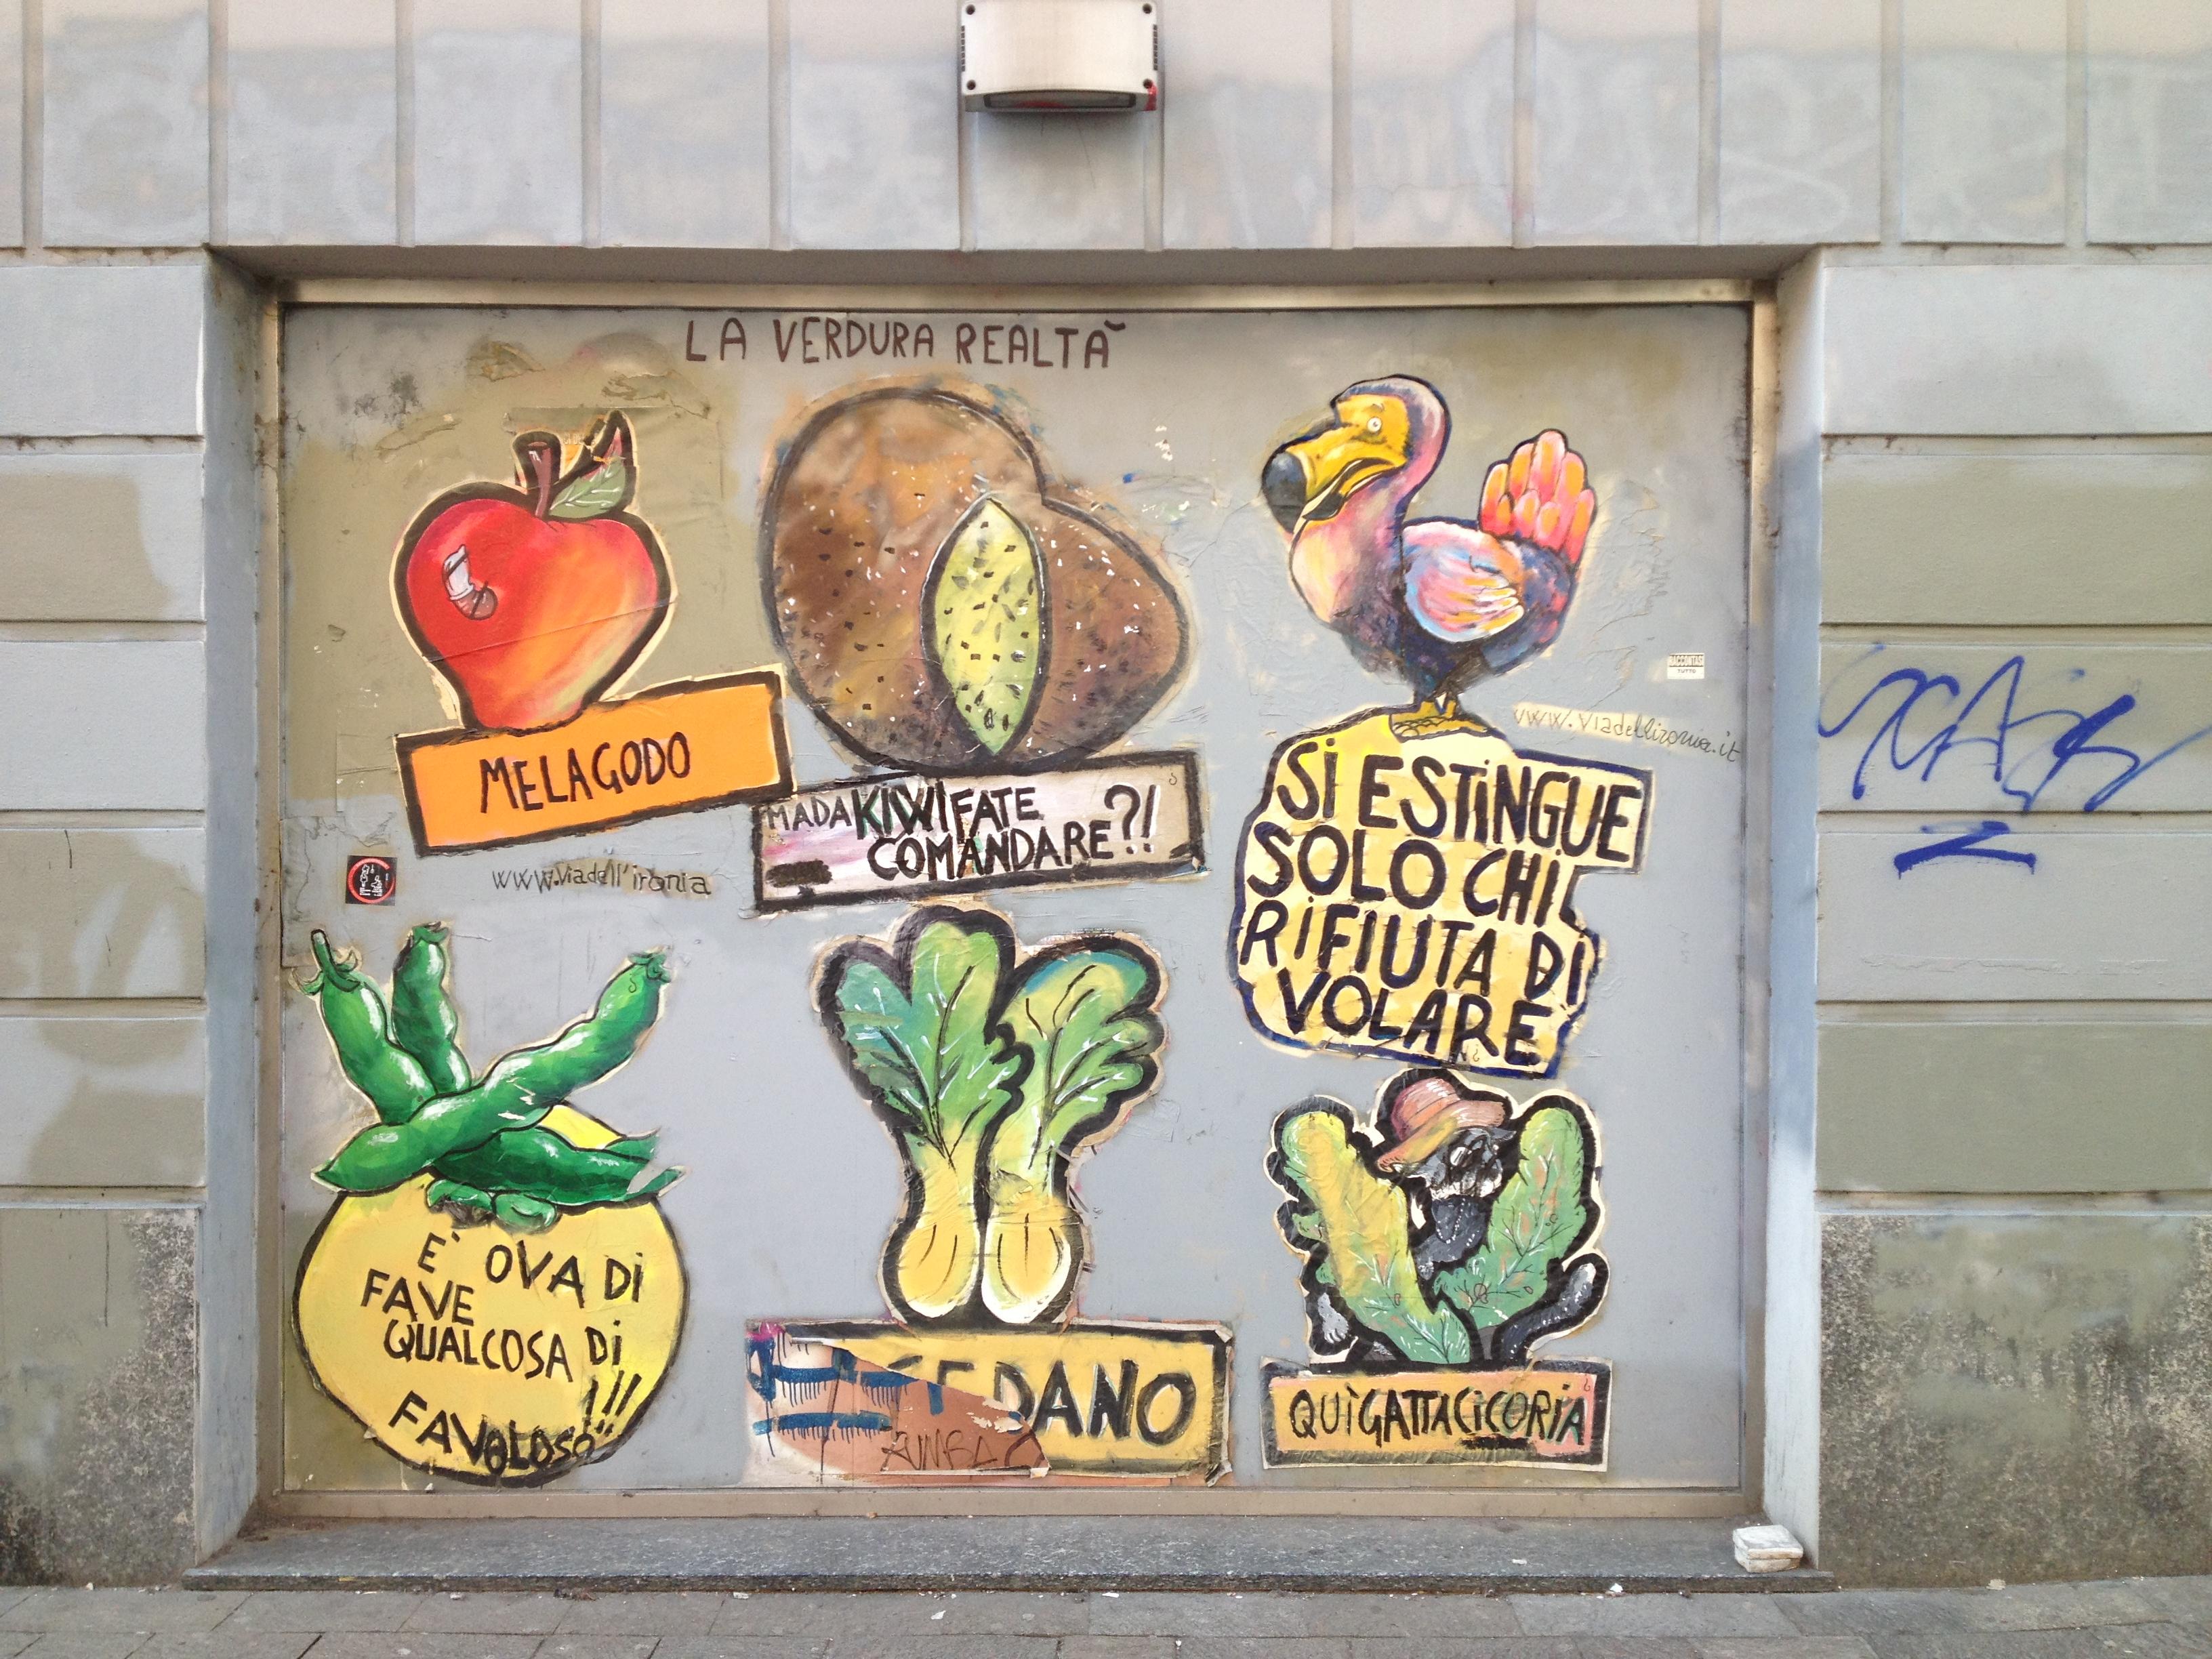 Street art 'vegetale' in Corso di Porta Ticinese @oltreilbalcone.